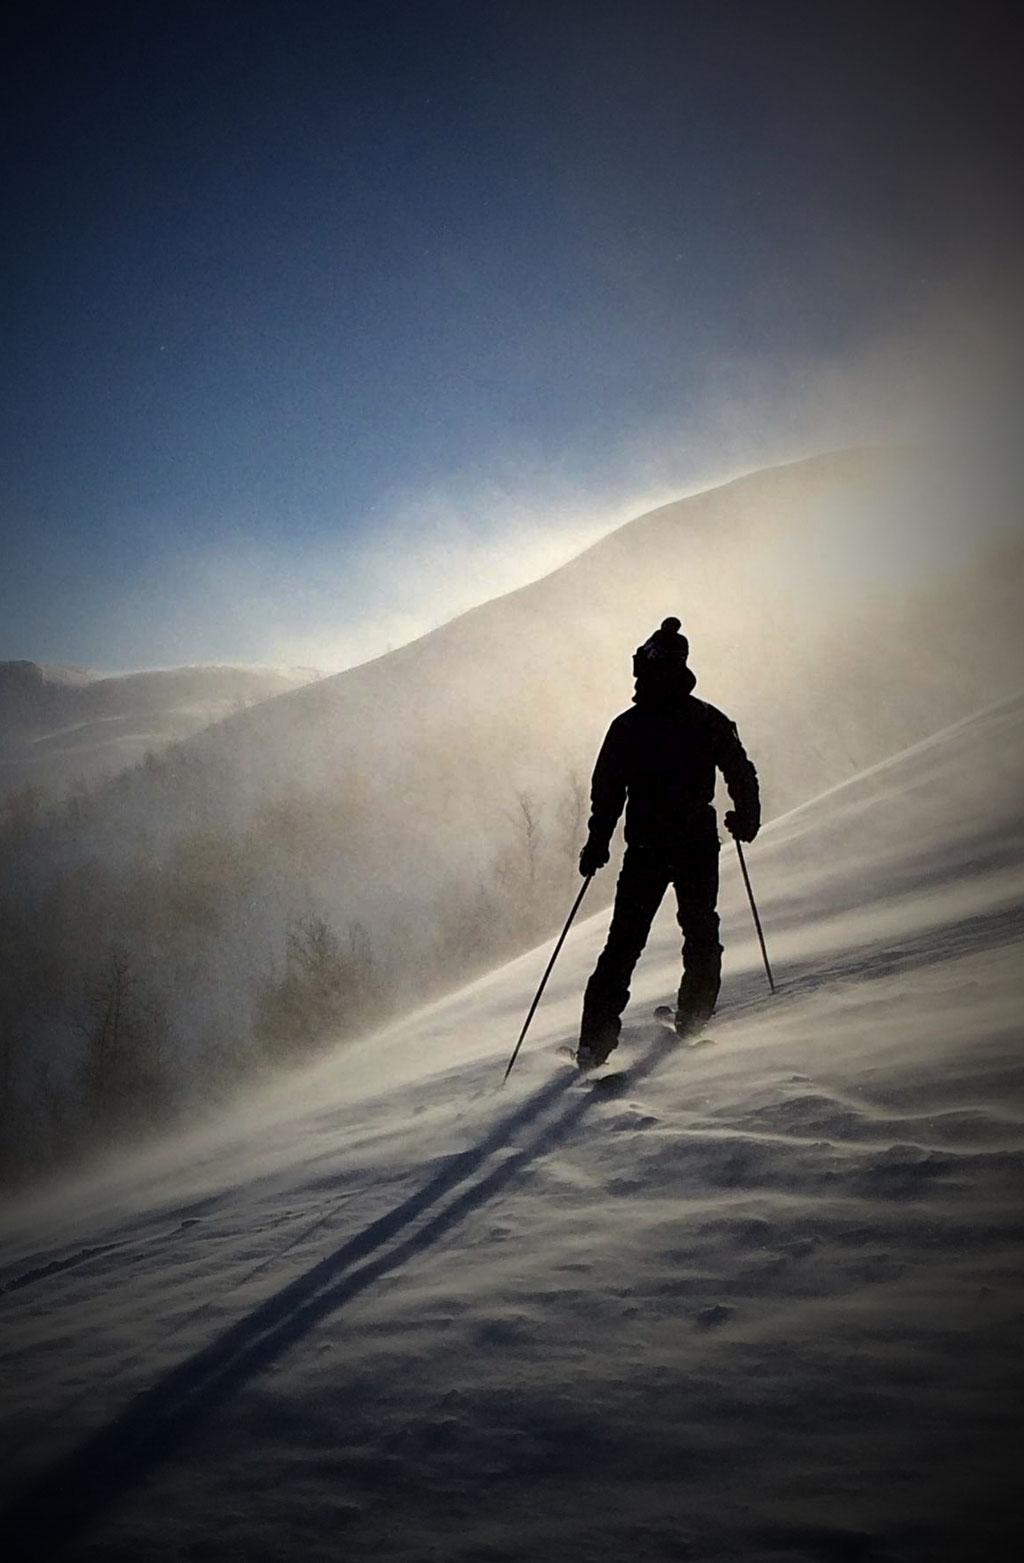 Le ski en liberté